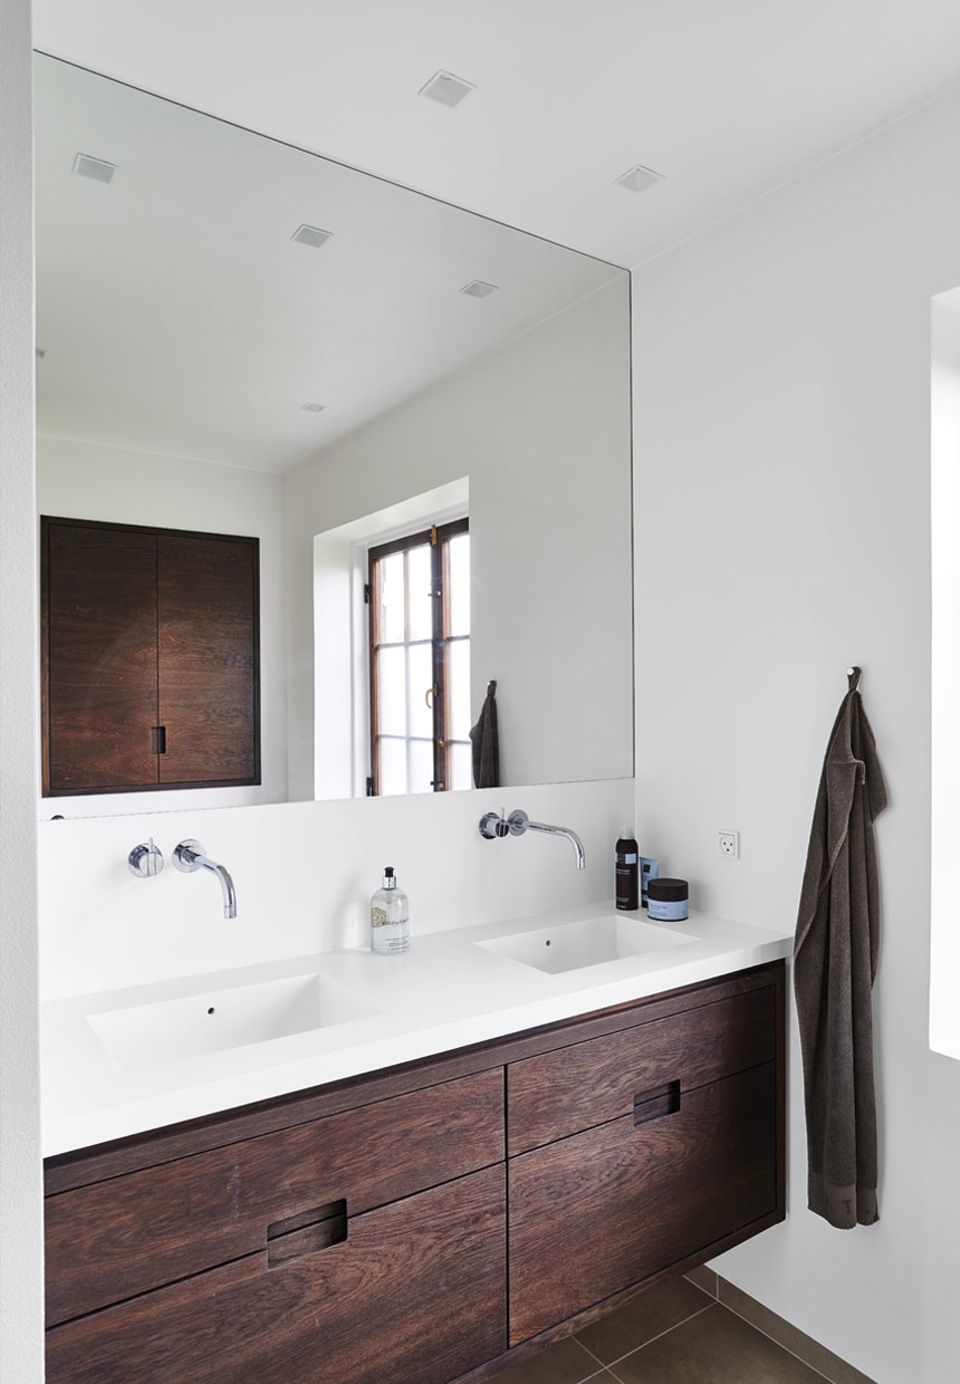 sink from duravit | new life of arne jacobsen hits | stuff, Badezimmer ideen